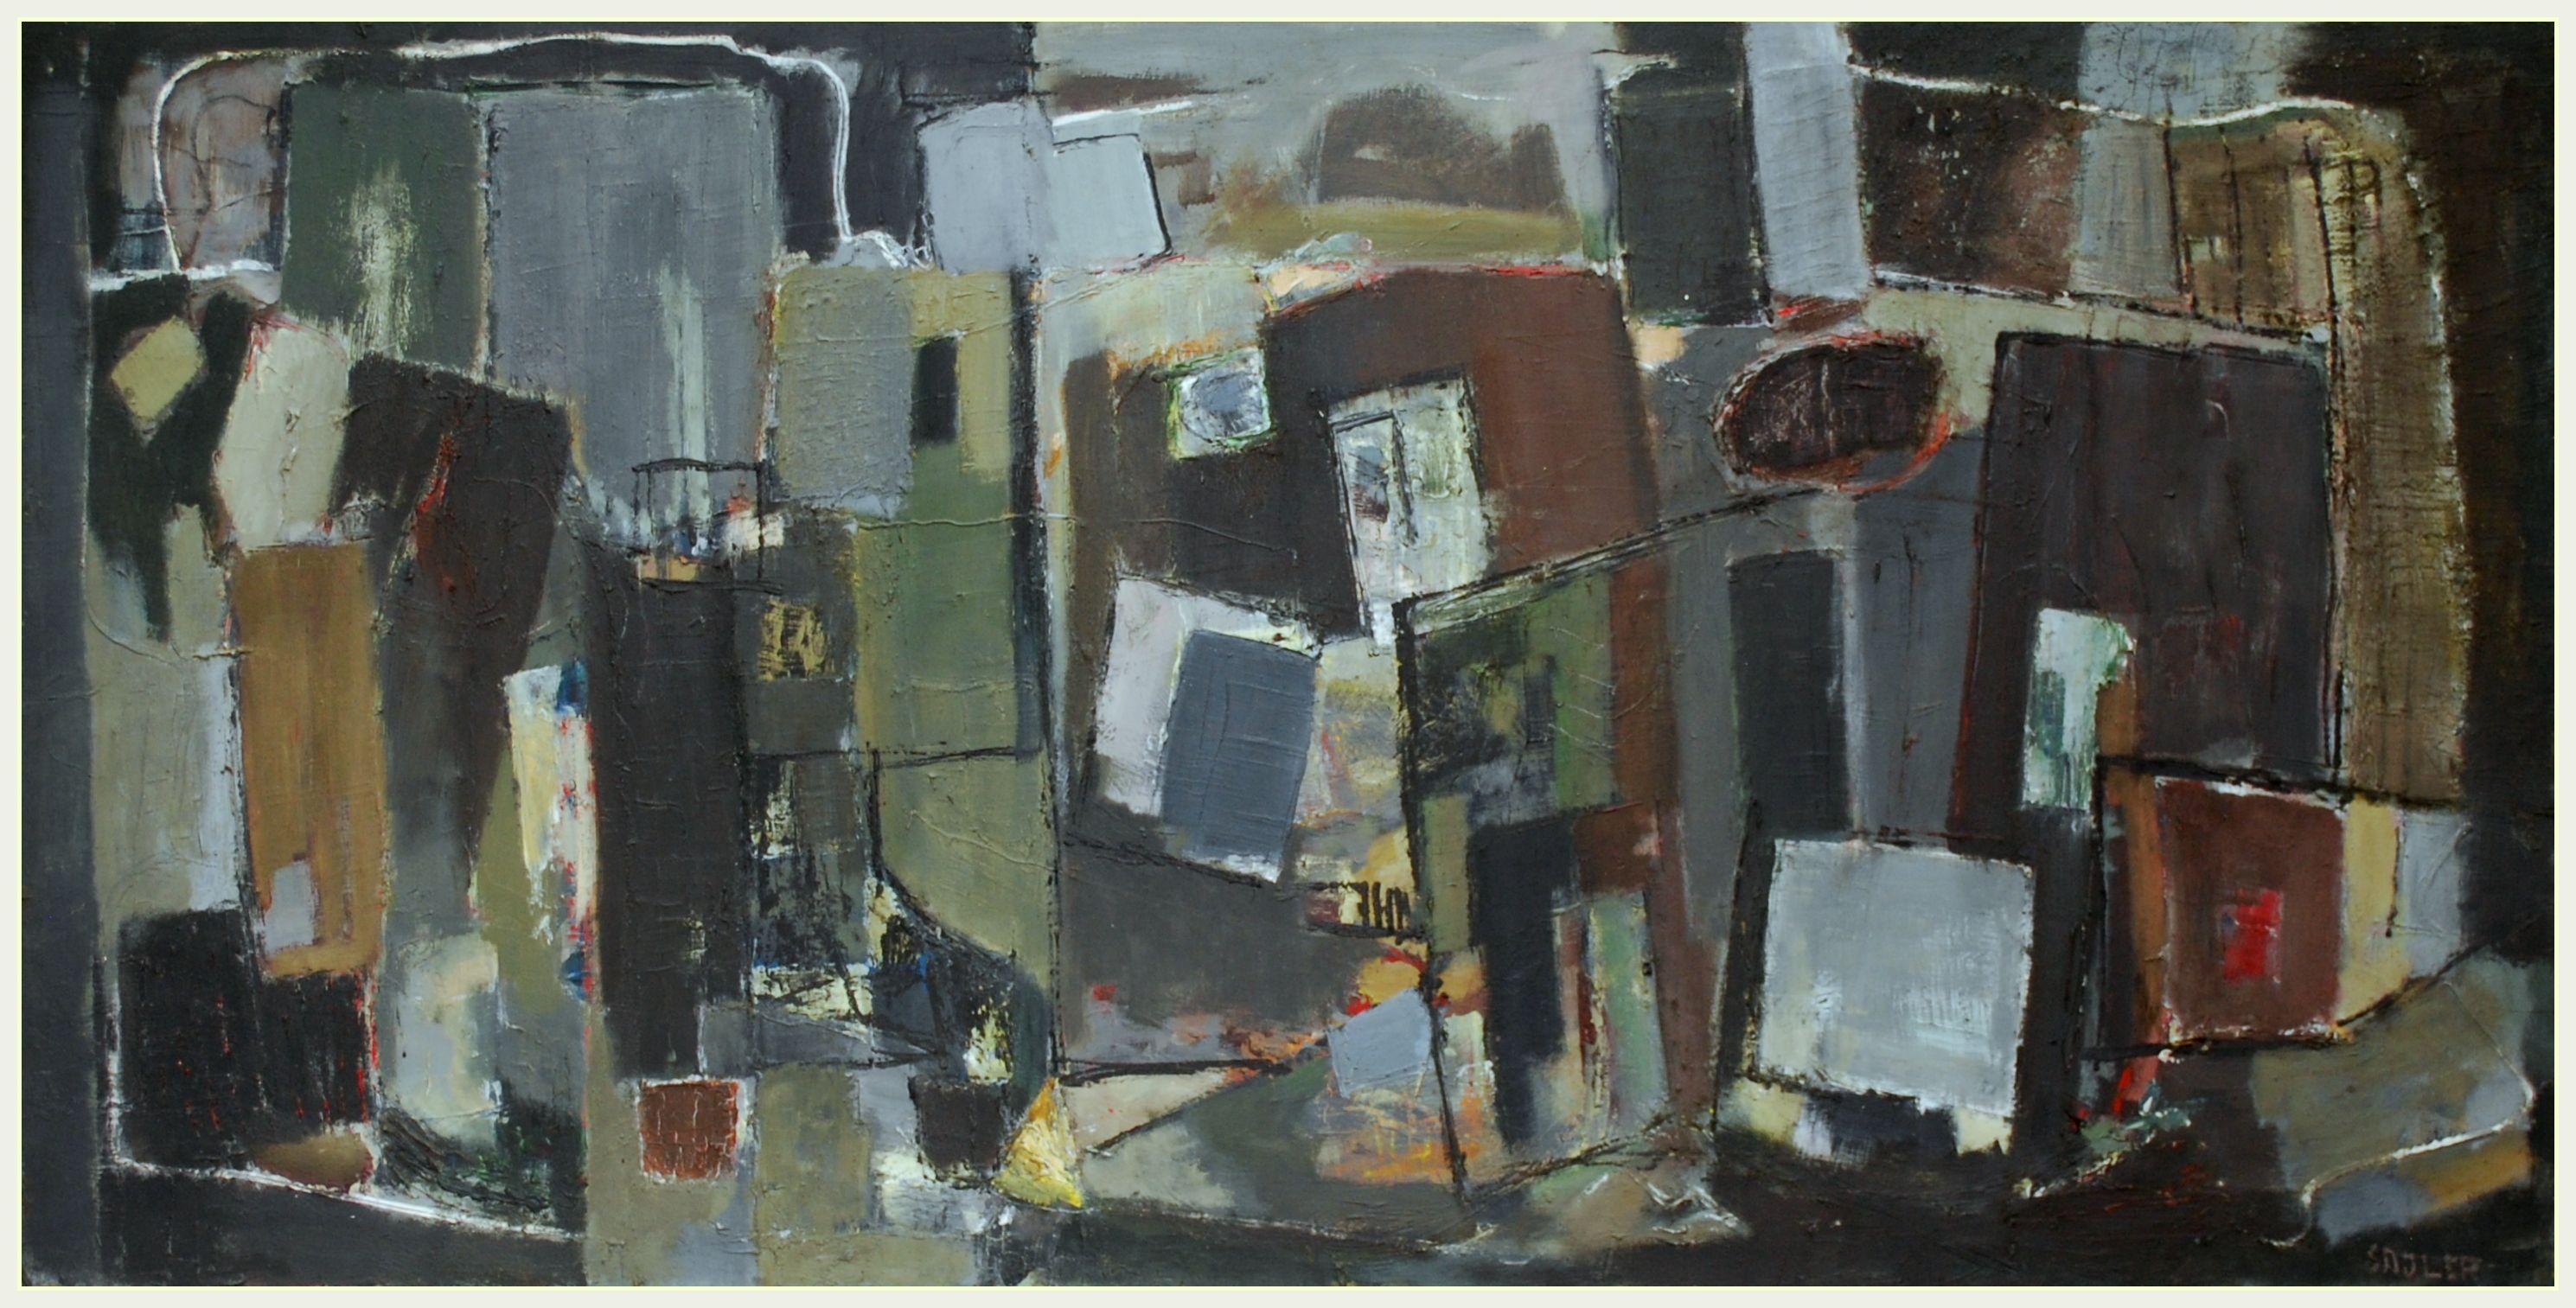 Mid20th century modern british abstract art by robert